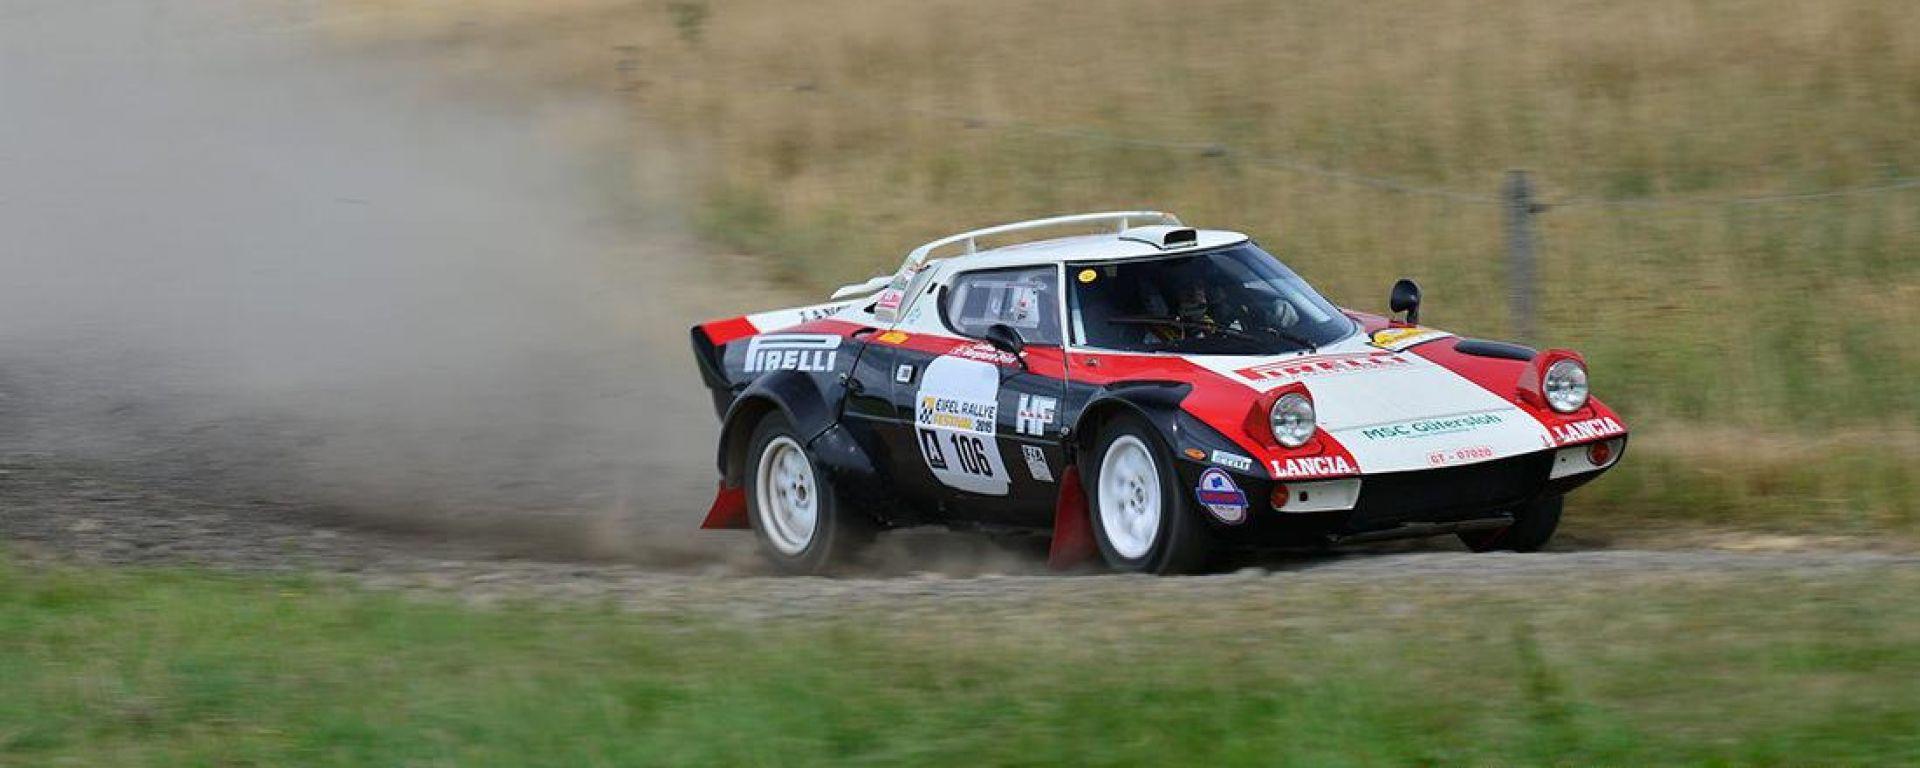 Lancia Stratos: al via il 66° raduno al Rally di Sanremo